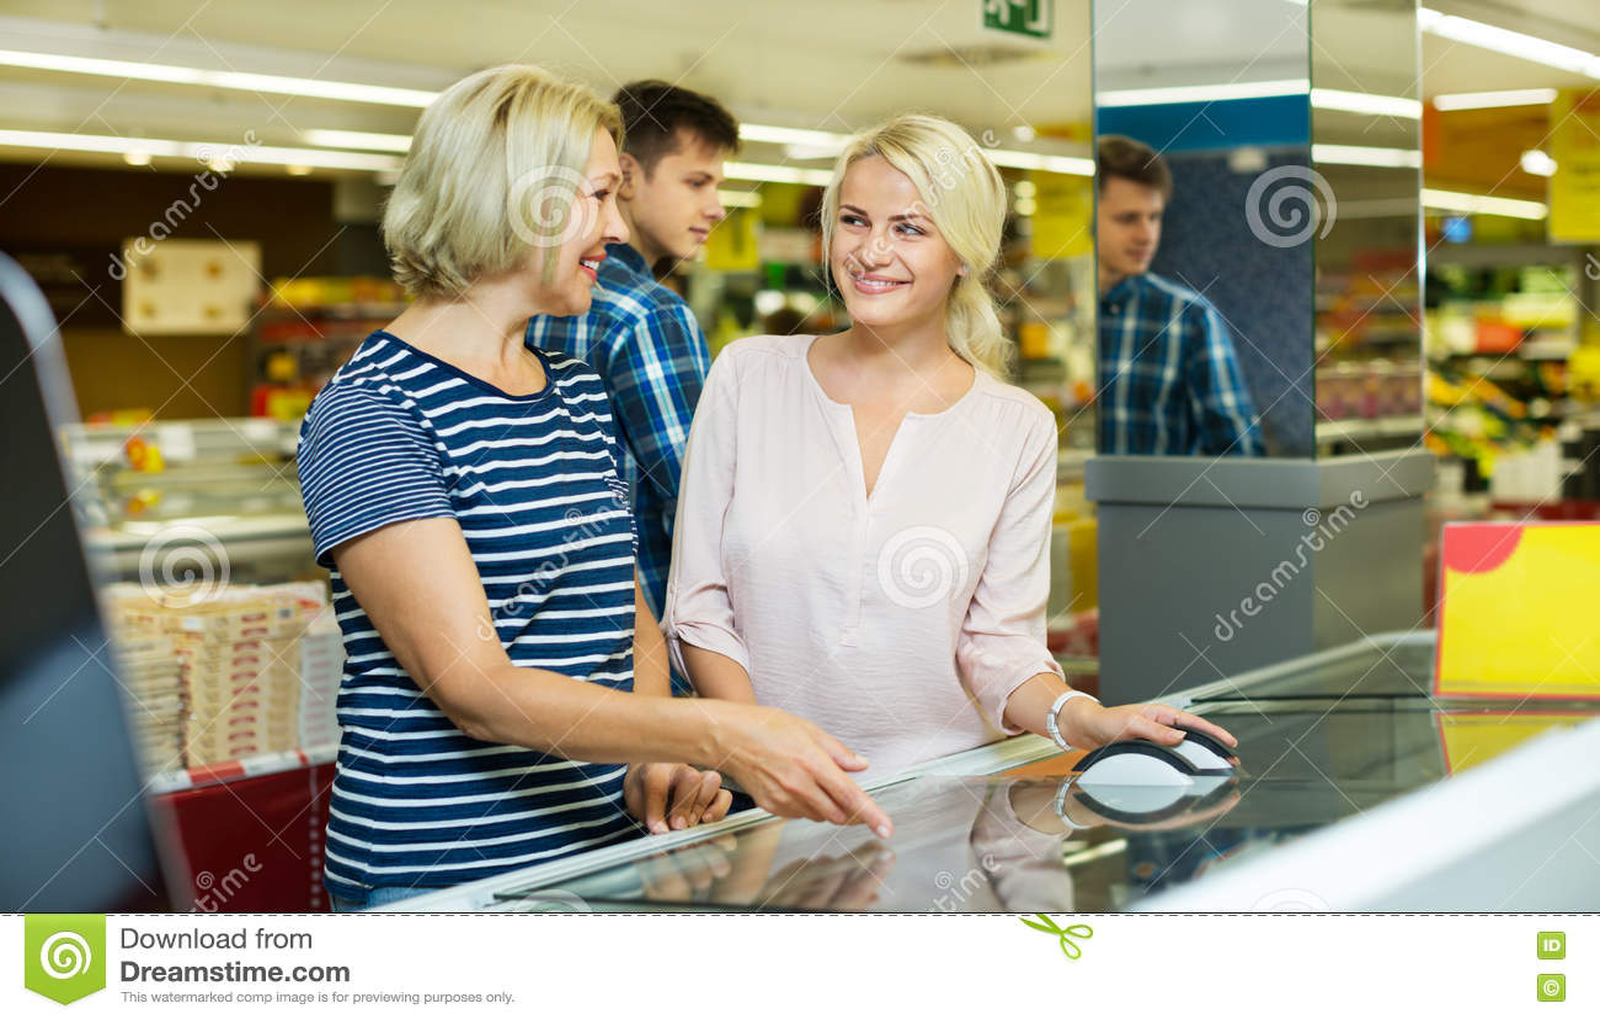 Russian Food Store Near